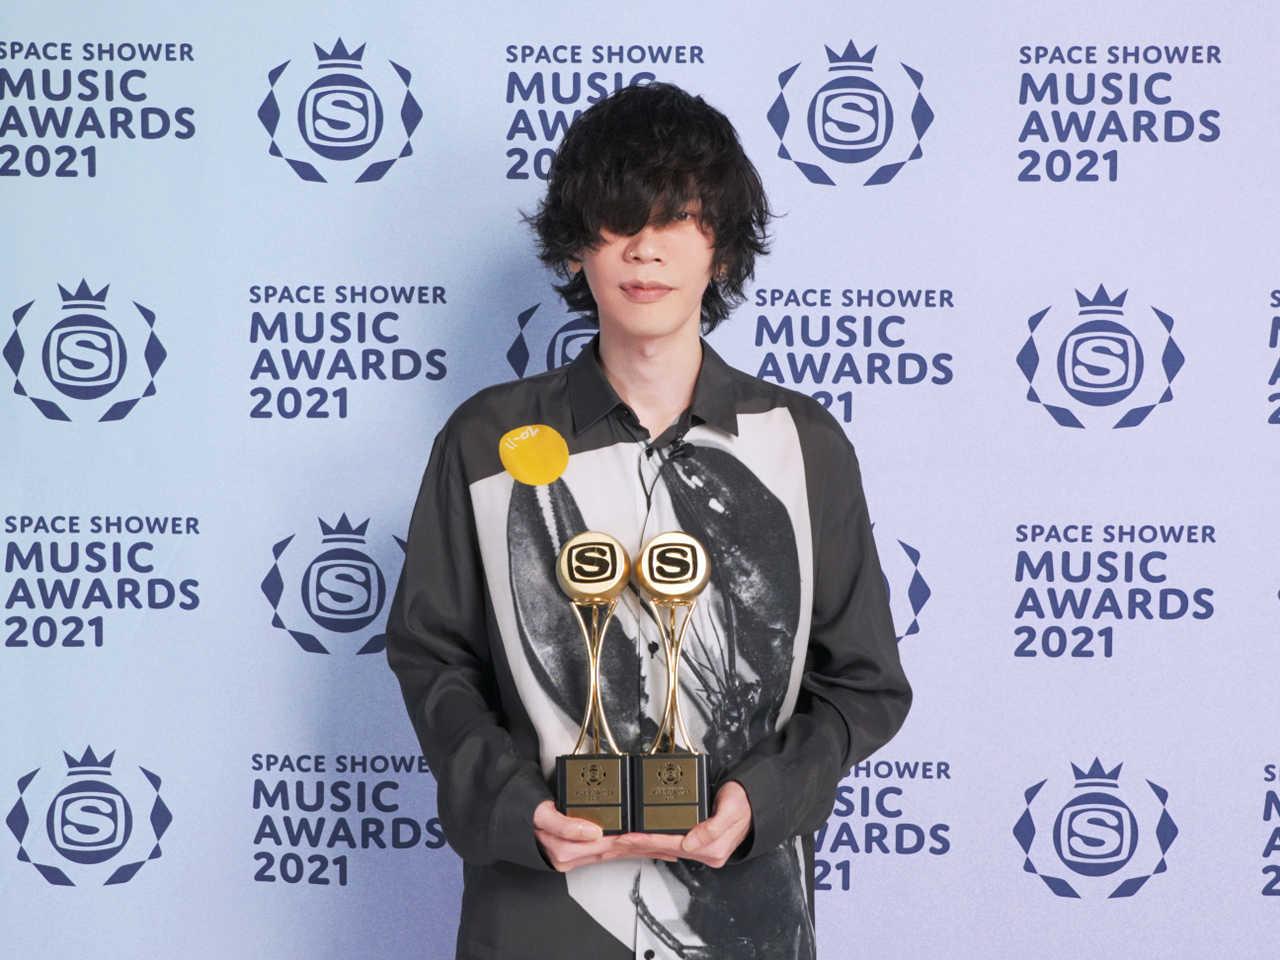 米津玄師「SPACE SHOWER MUSIC AWARDS 2021」2部門受賞!